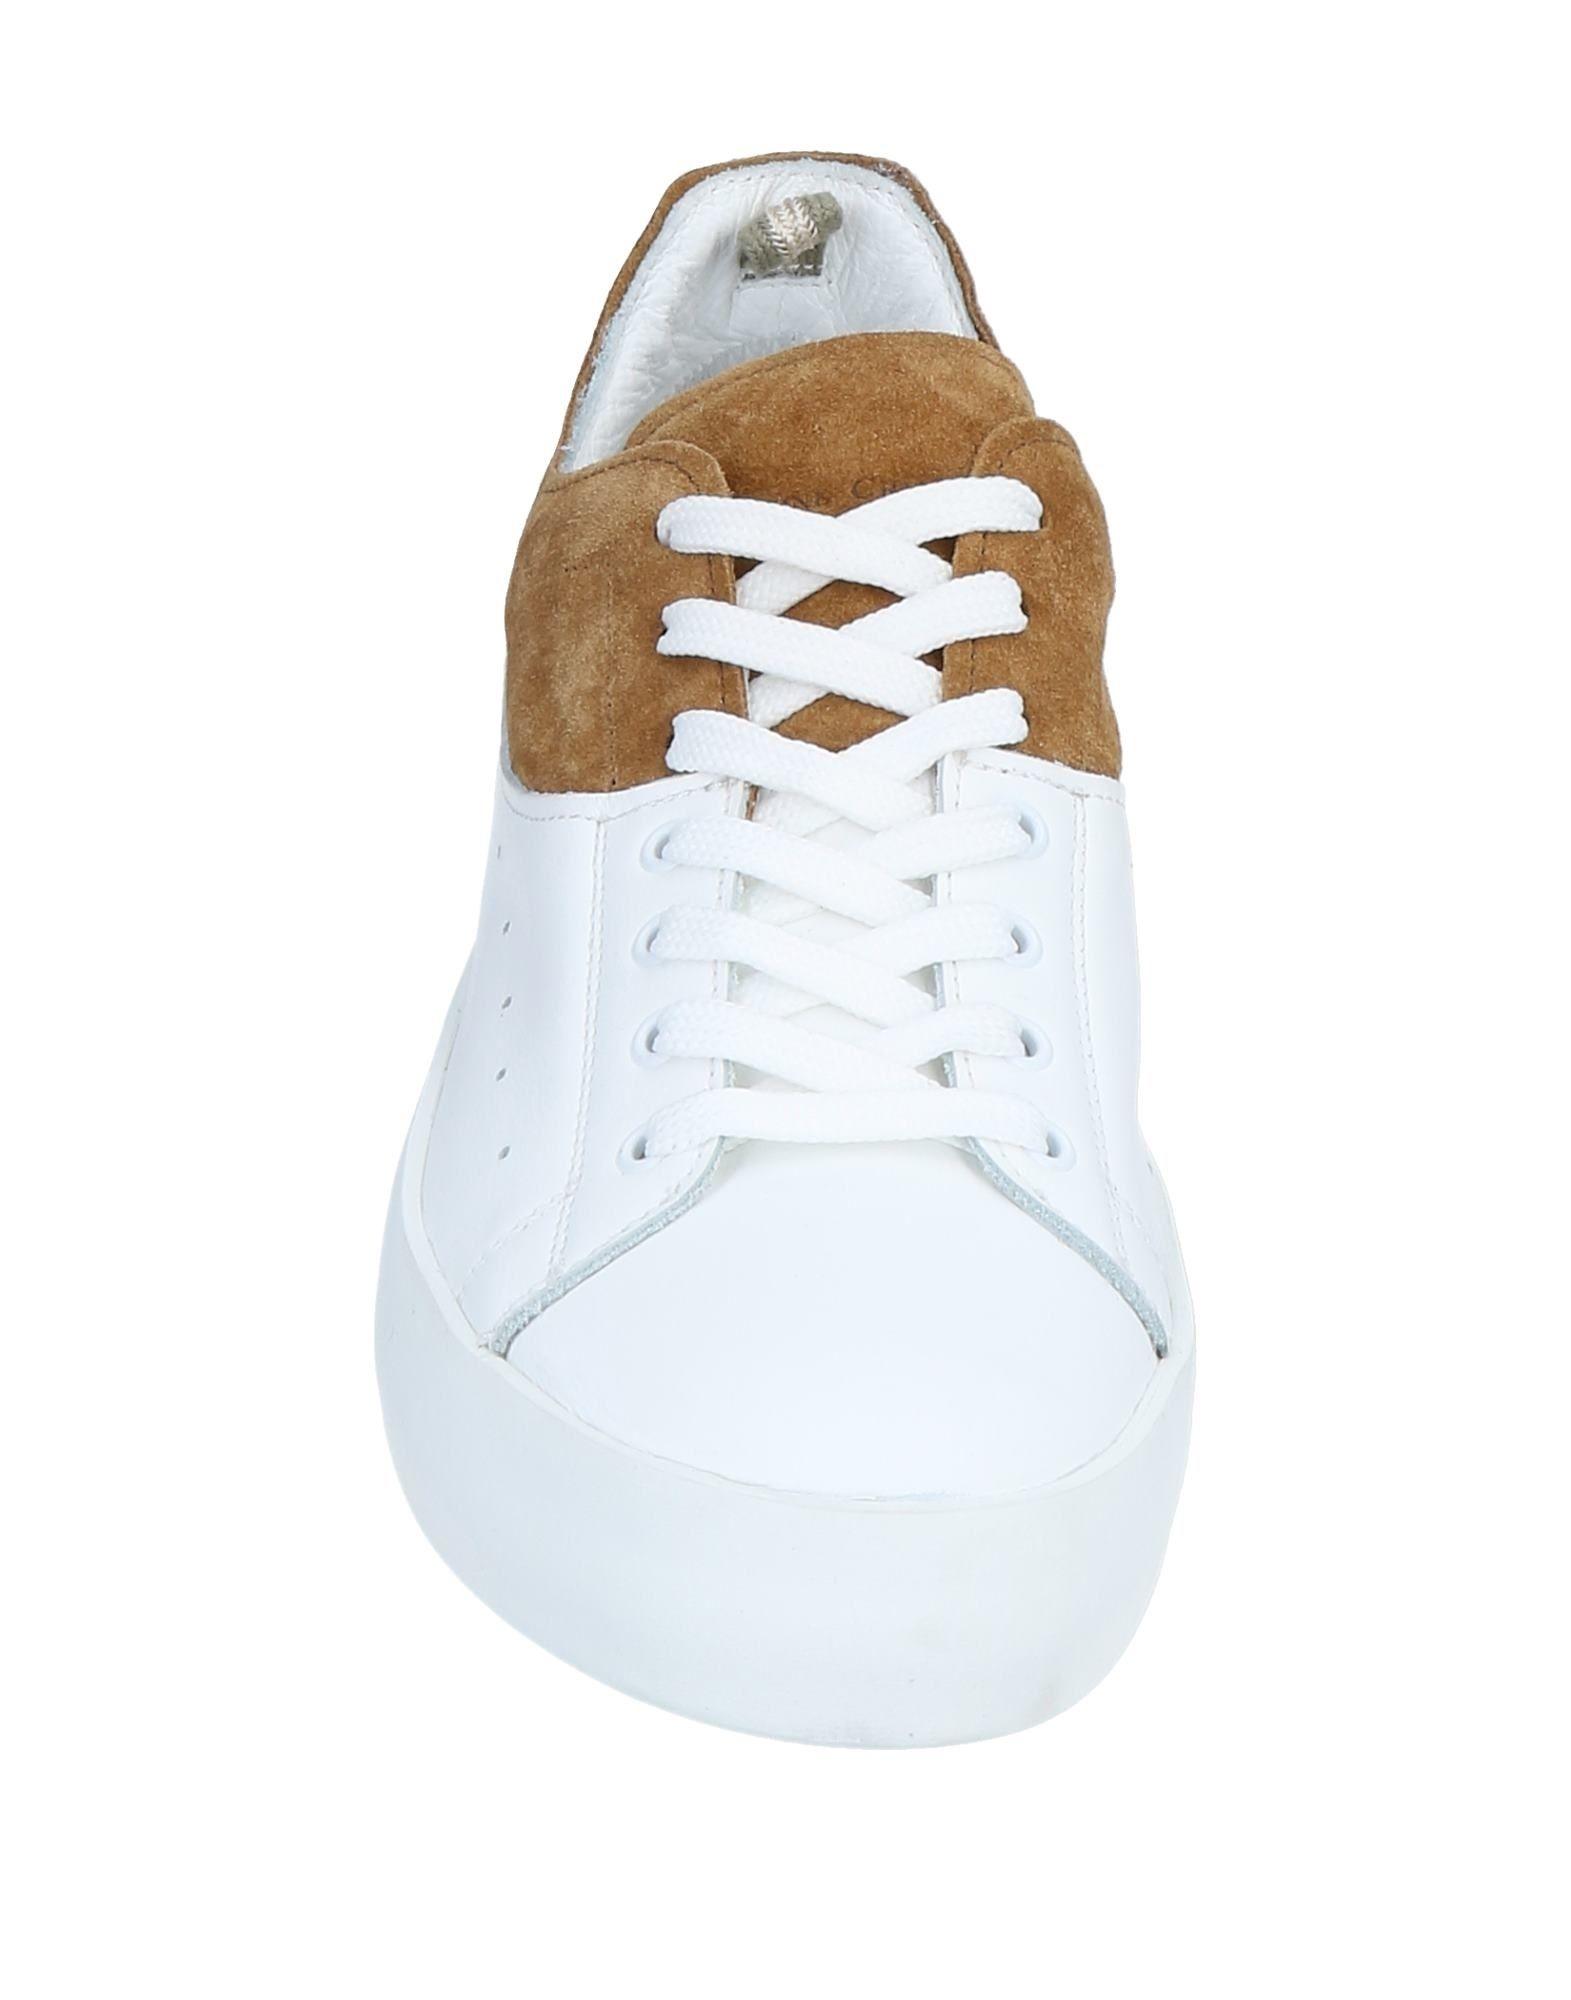 Officine Creative Italia Sneakers - Men Officine Creative Italia Sneakers Sneakers Sneakers online on  Canada - 11562480LE 4267d5